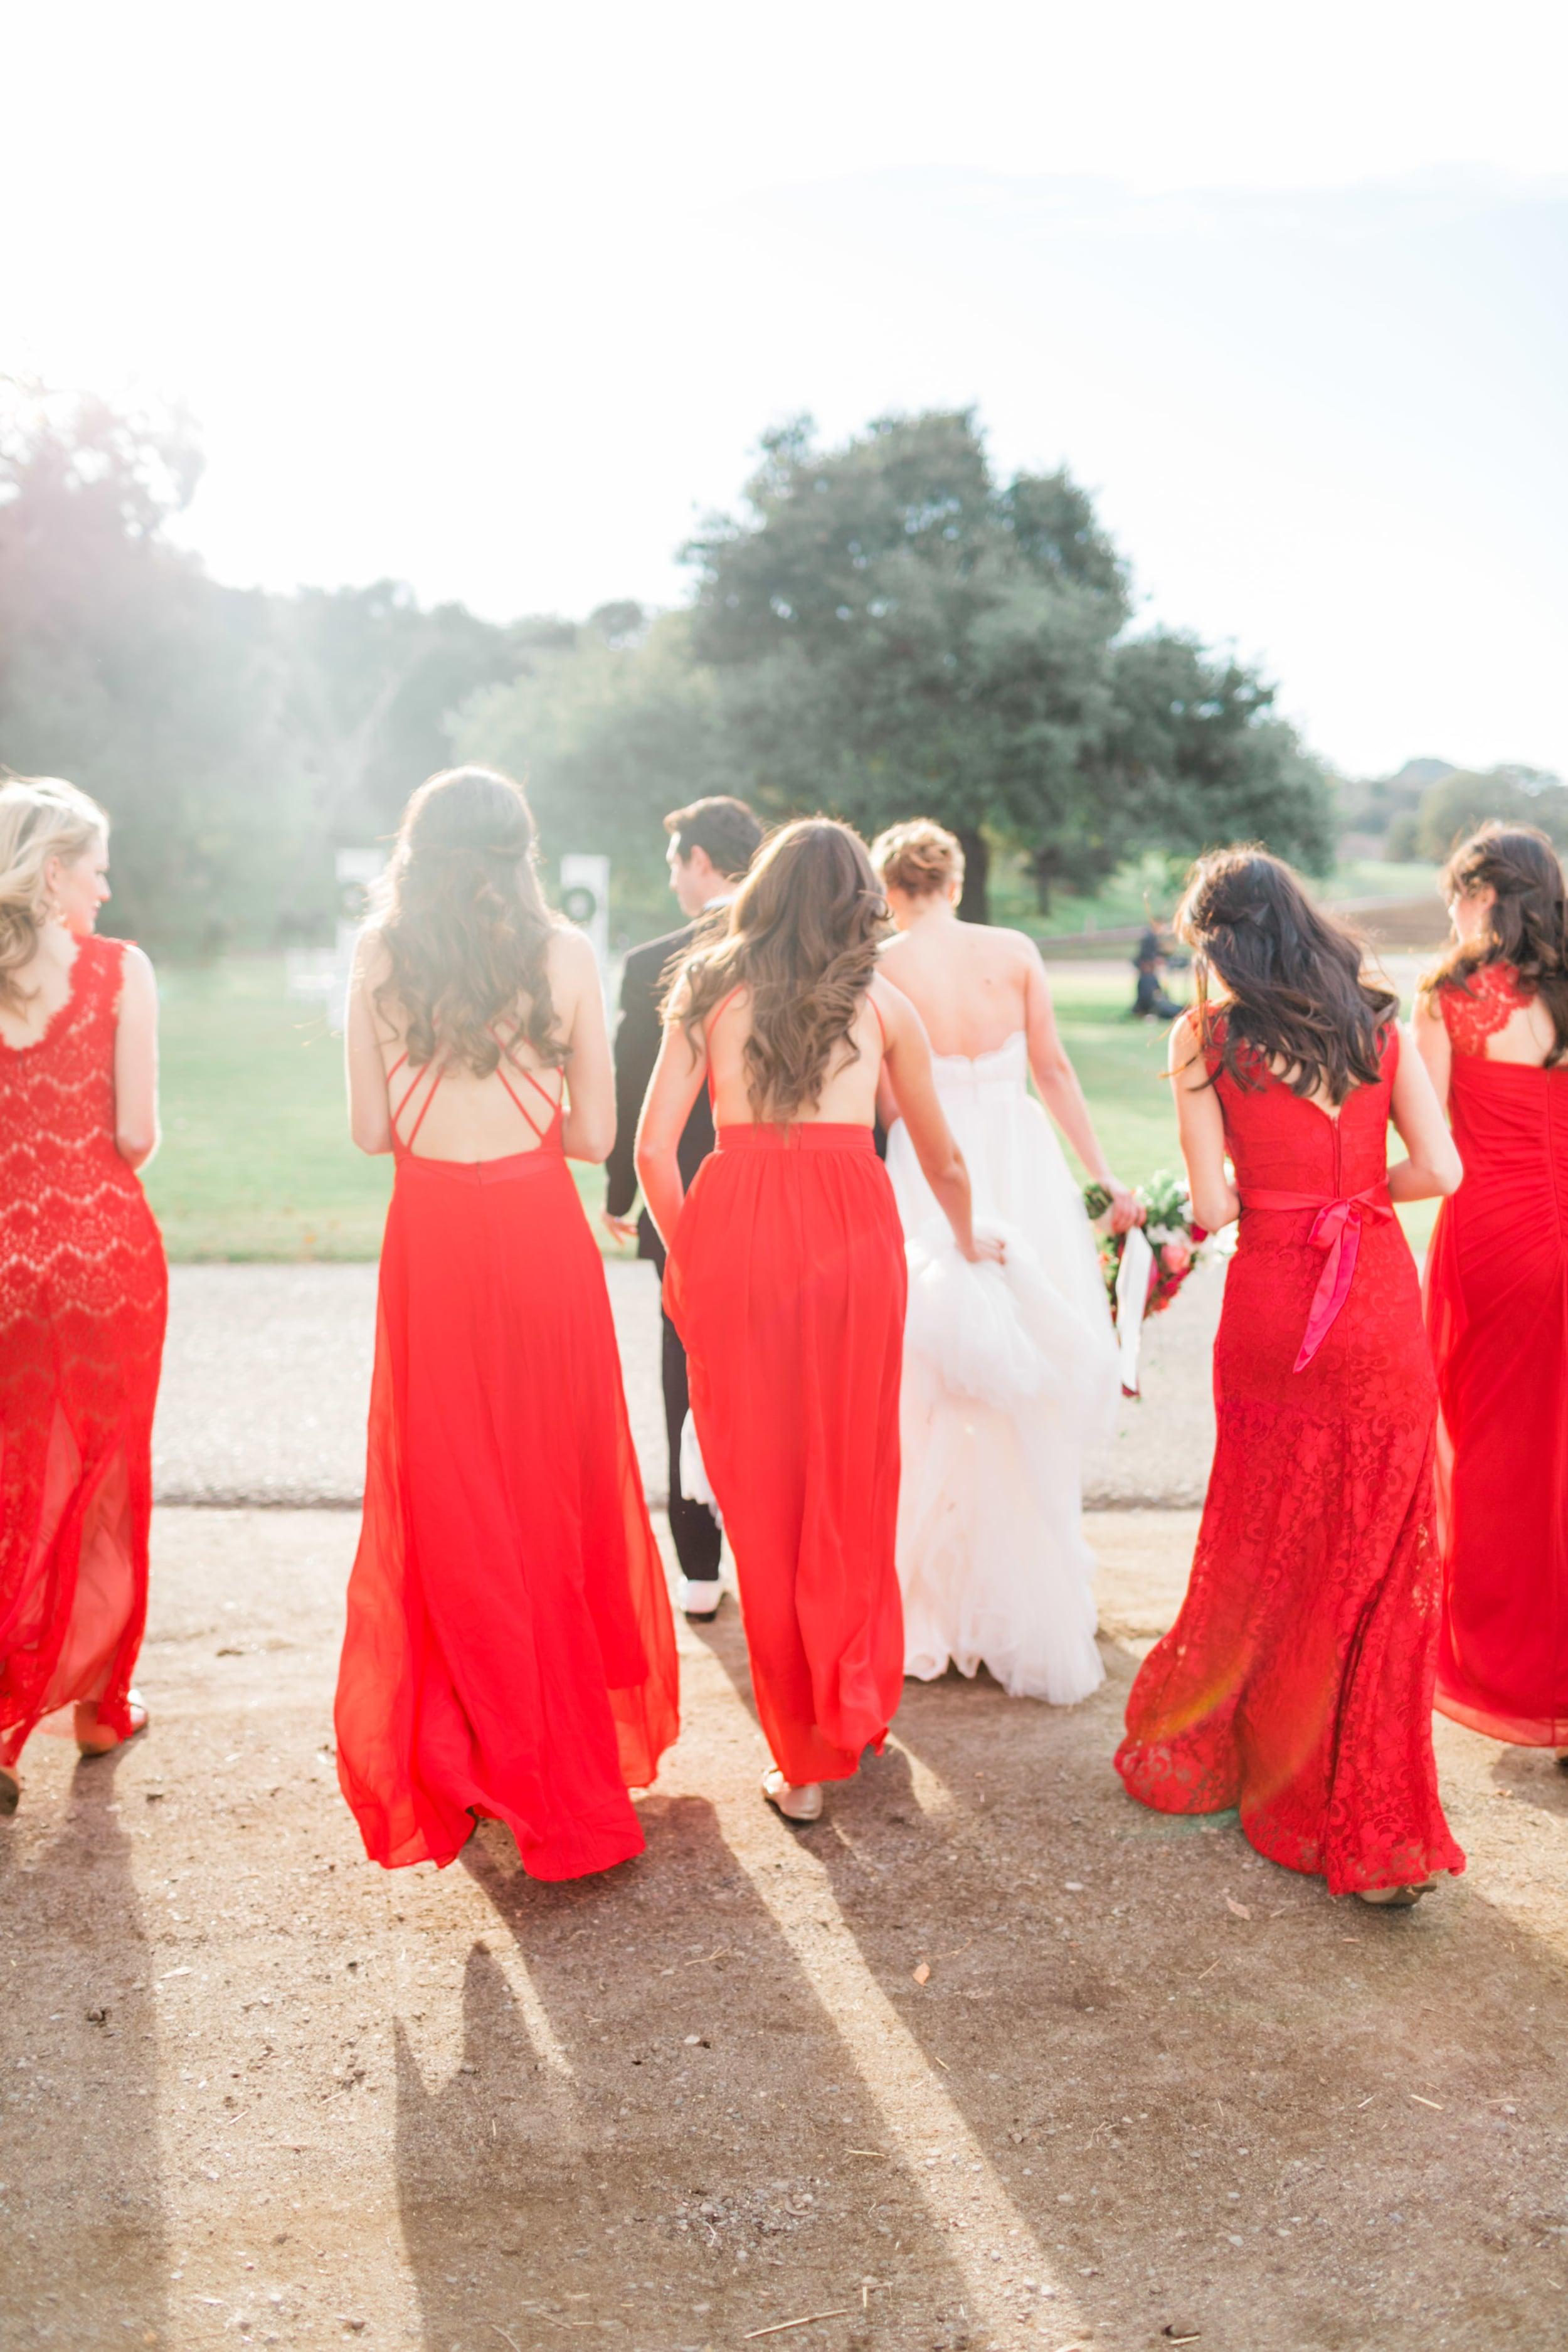 Natalie_Schutt_Photography_Winter_Wedding_San_Luis_Obispo-153.jpg